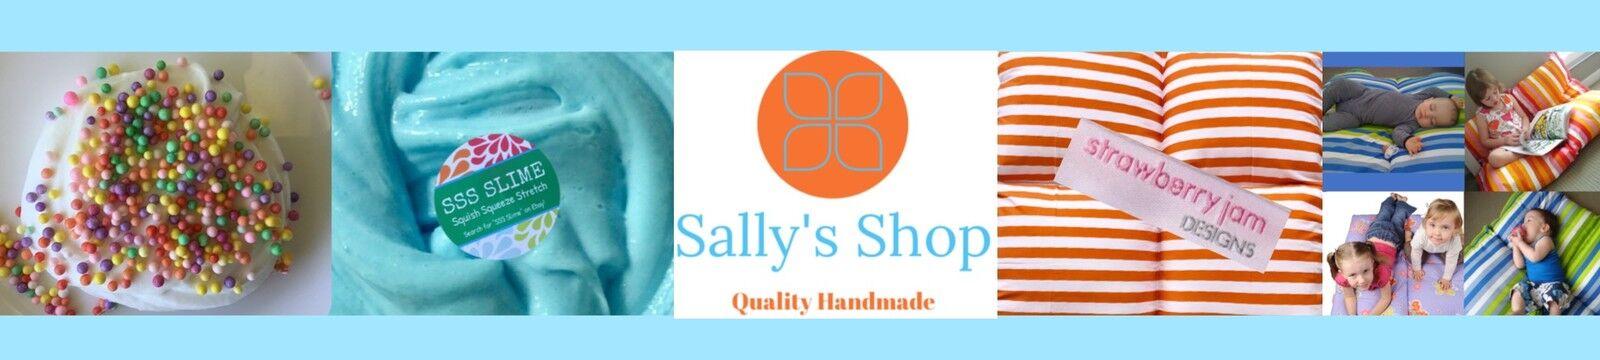 Sally's Shop